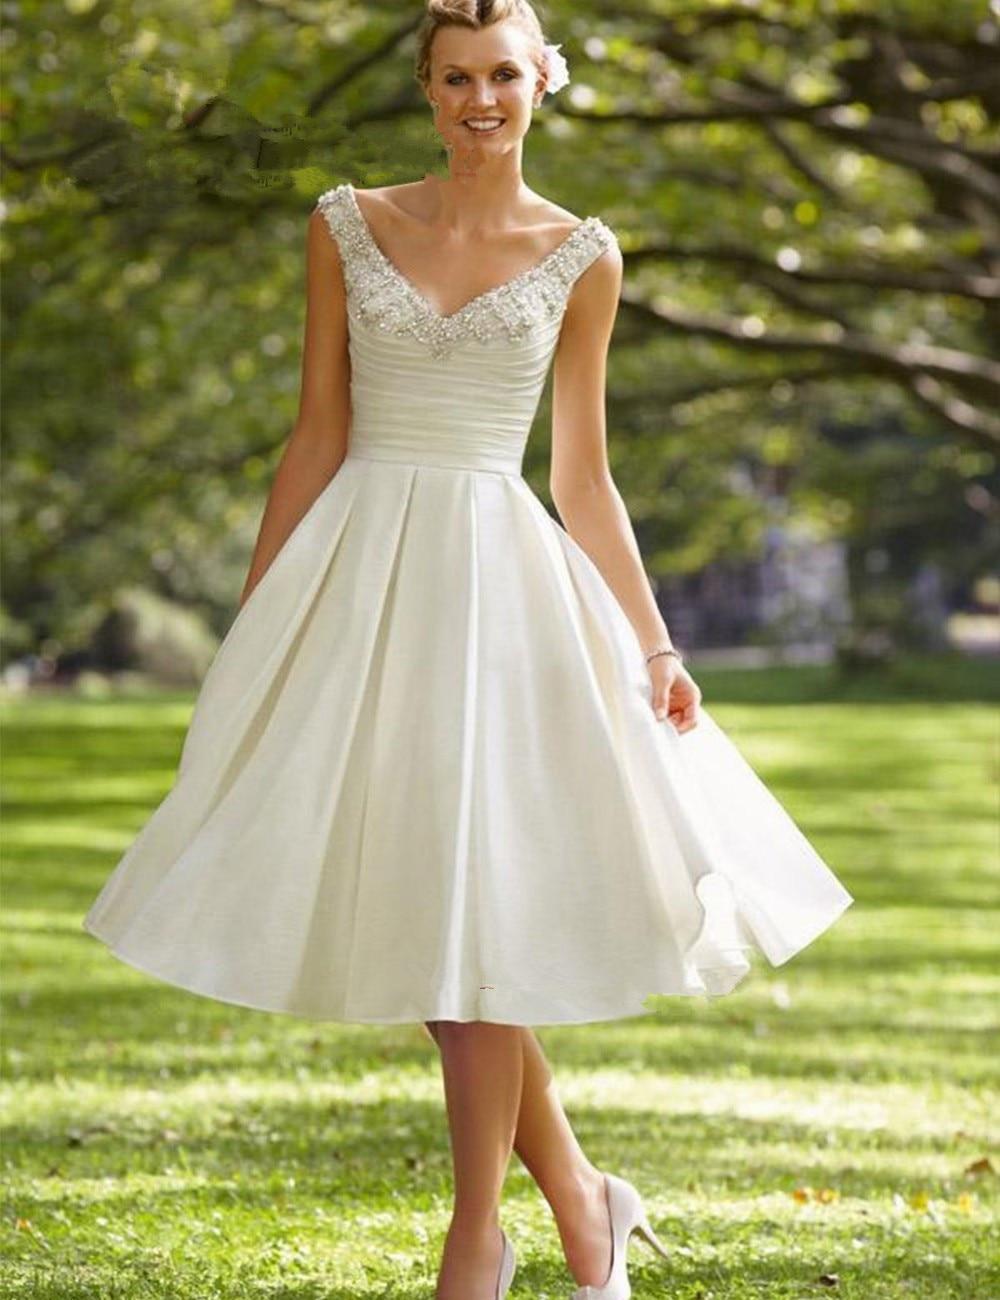 Vestido De Noiva Curto Modest Ivory Short Knee Length Crystal Beaded Satin V Neck Back Casamento Bridal Gown Bridesmaid Dresses